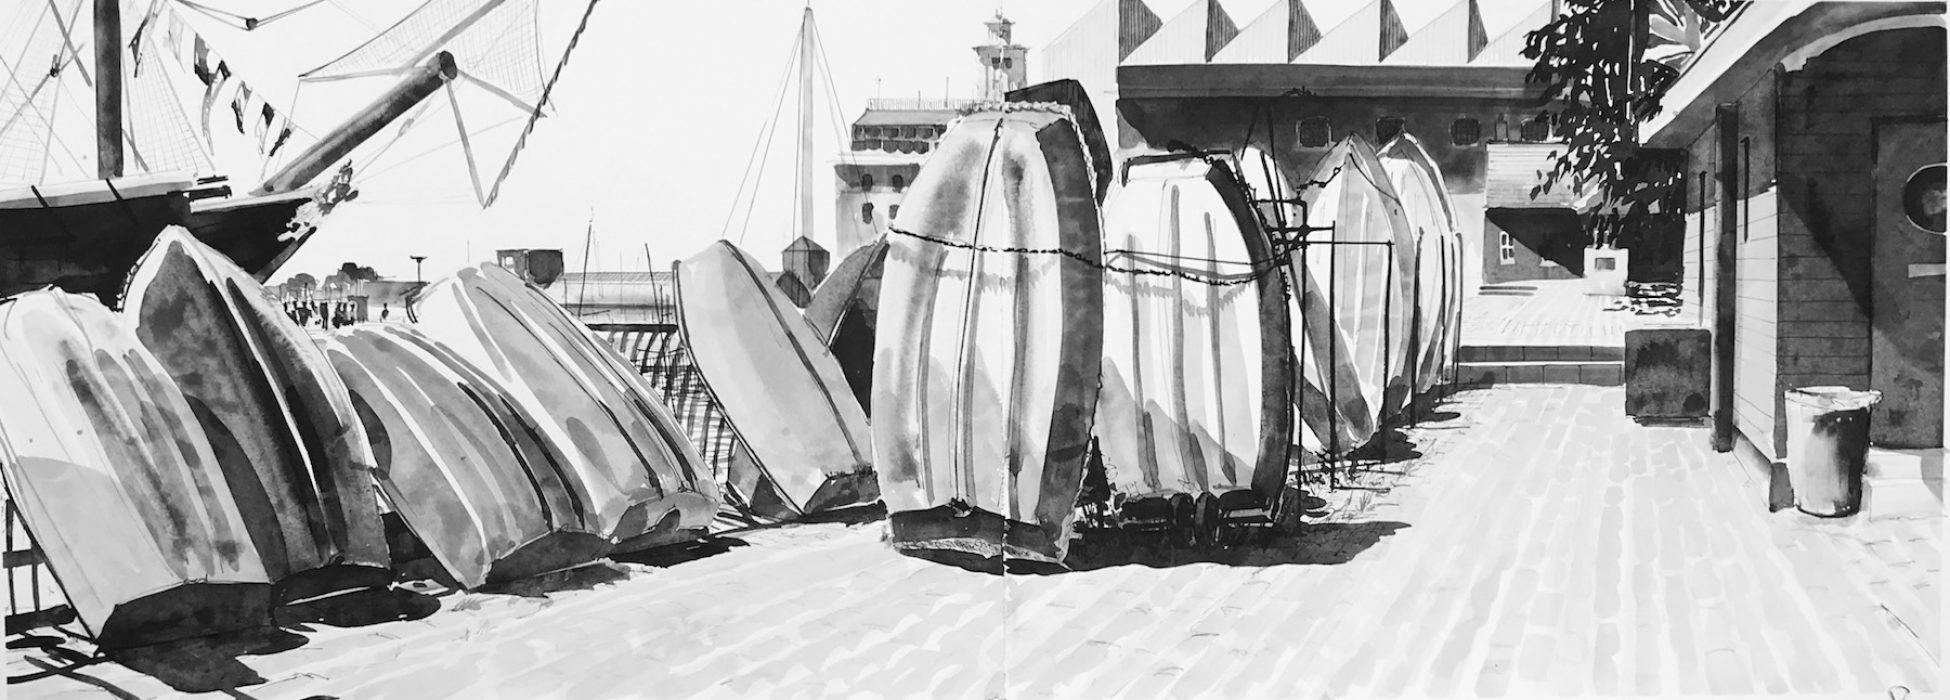 Sunny Day Portsmouth Hard 2019 55x150cms